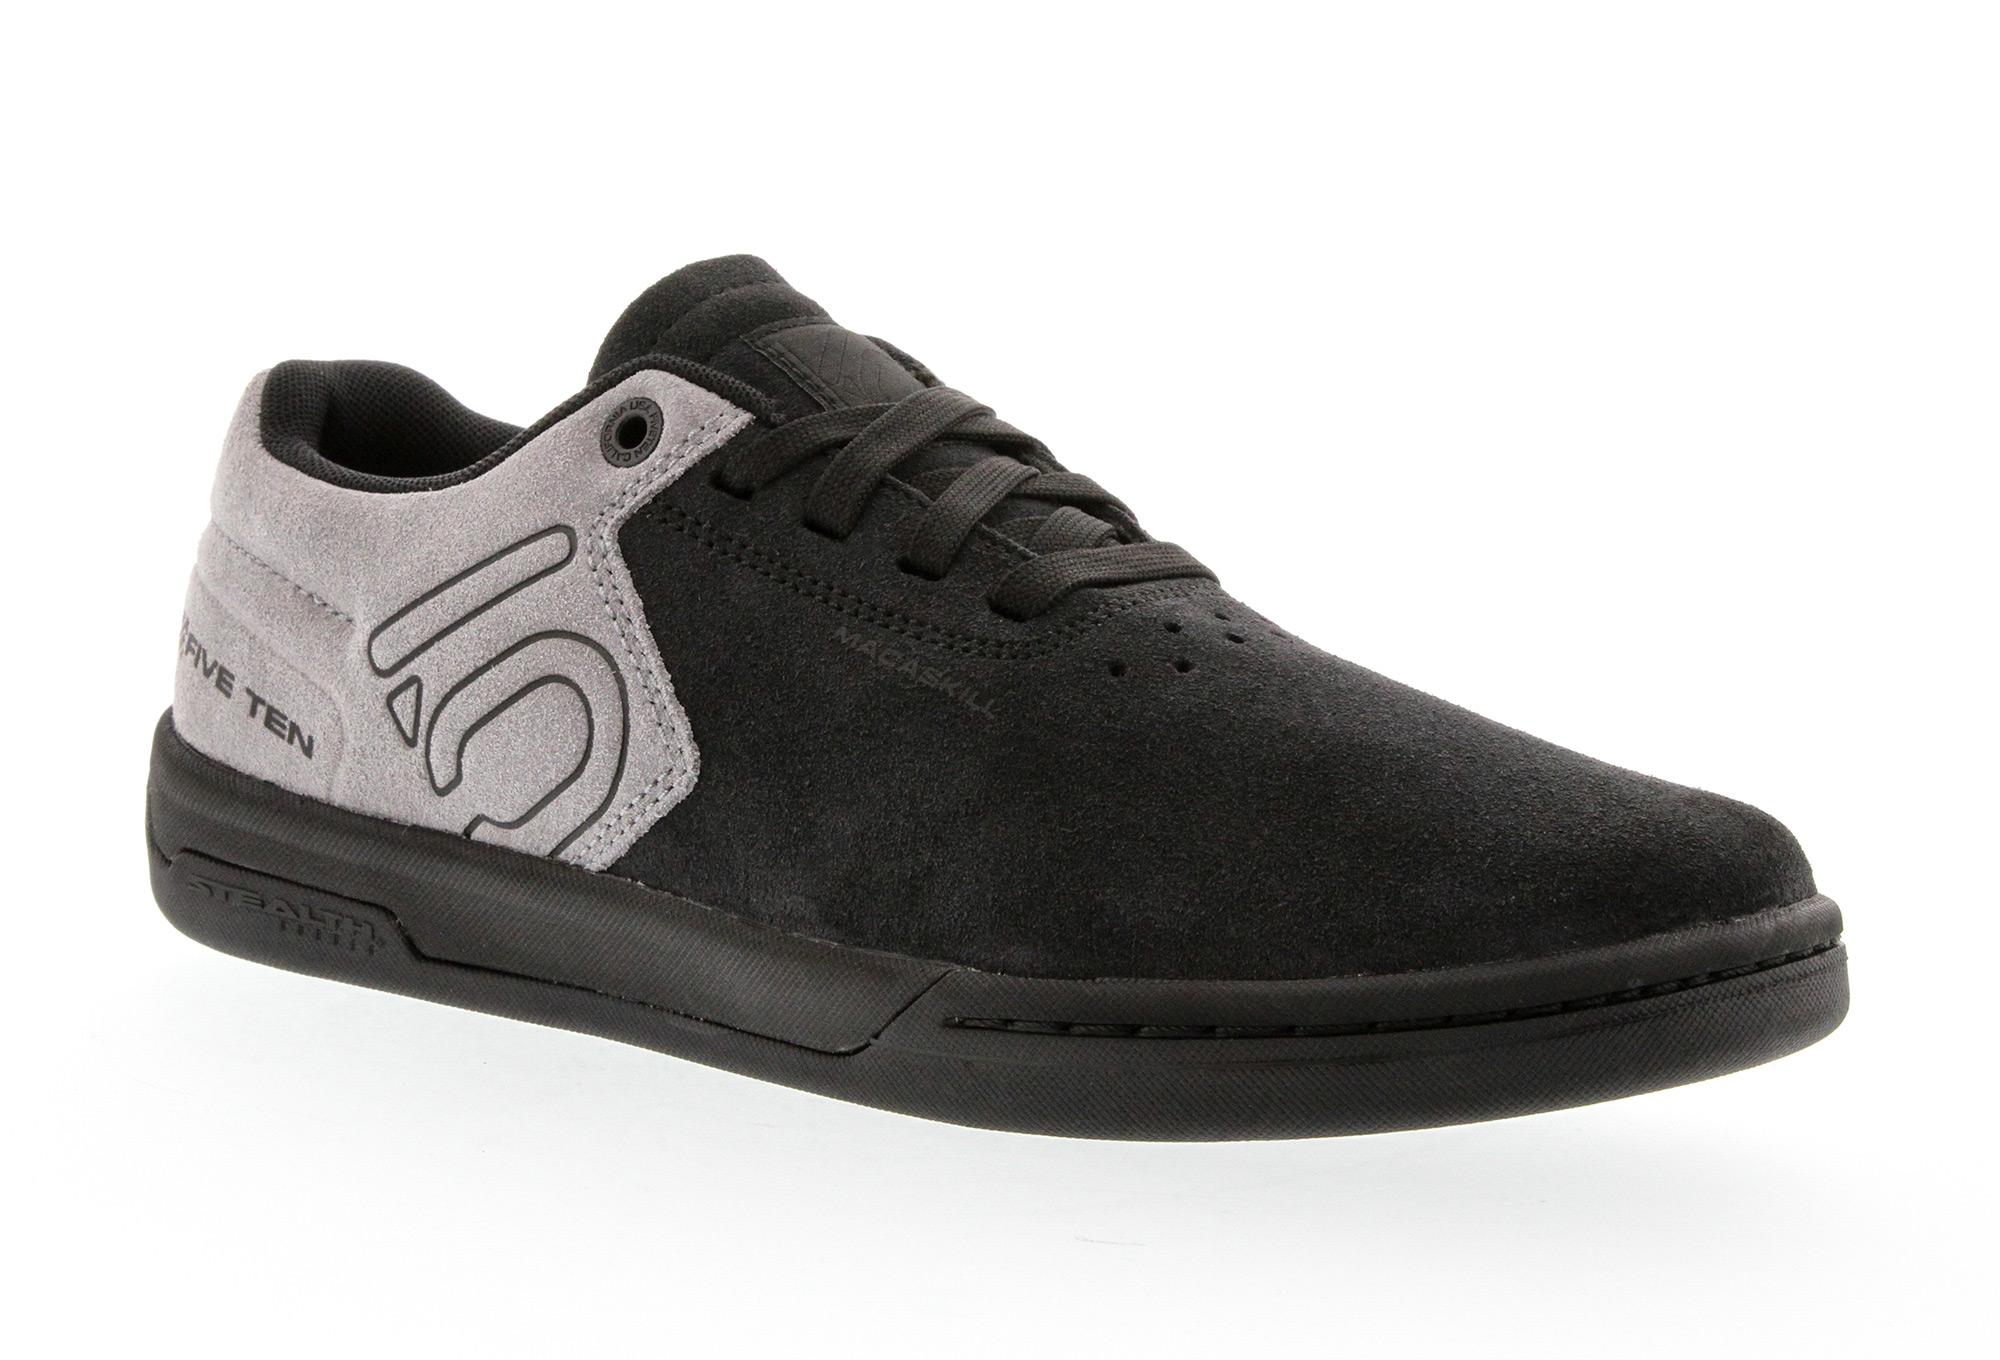 reputable site 2d16f 6b608 Schuhe FIVE TEN Danny Macaskill - Schwarz/Grau